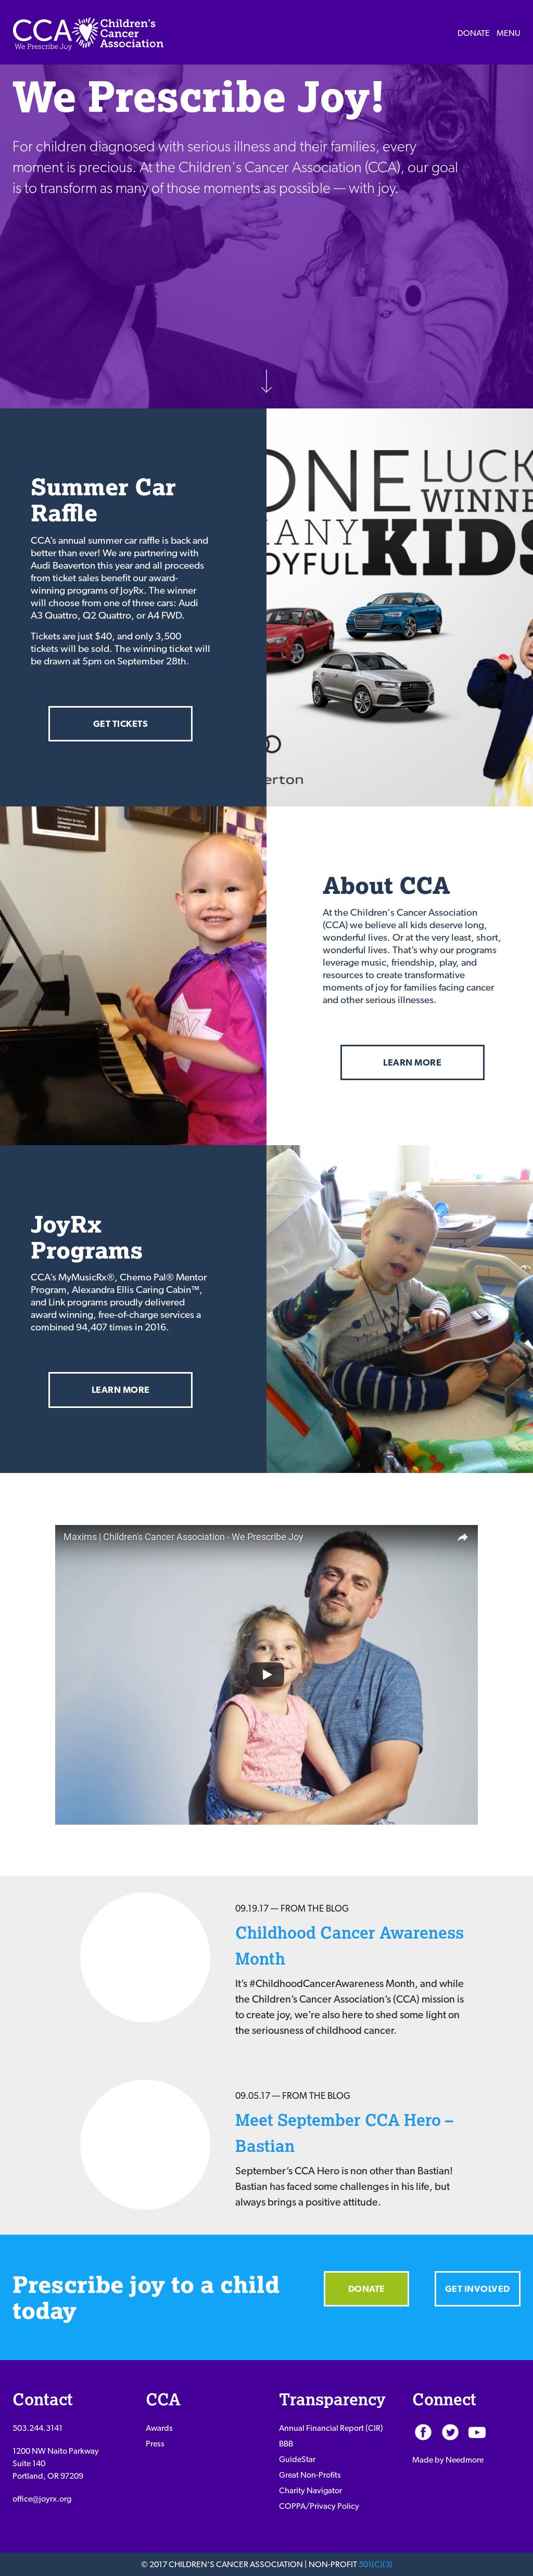 Joyrx Competitors, Revenue and Employees - Owler Company Profile